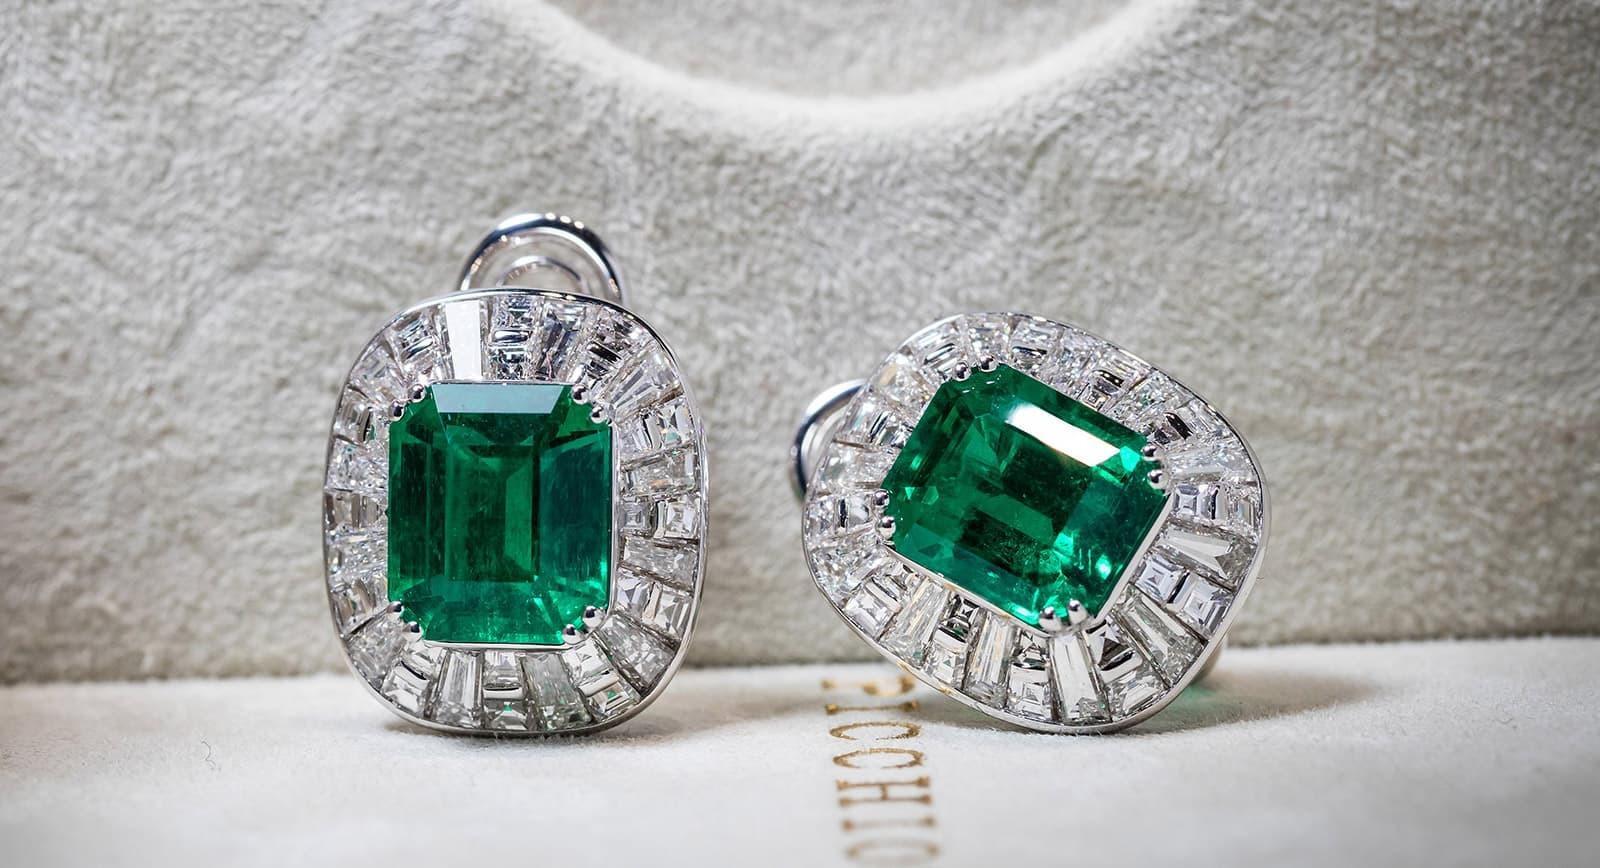 Emerald the 20th Anniversary Gemstone